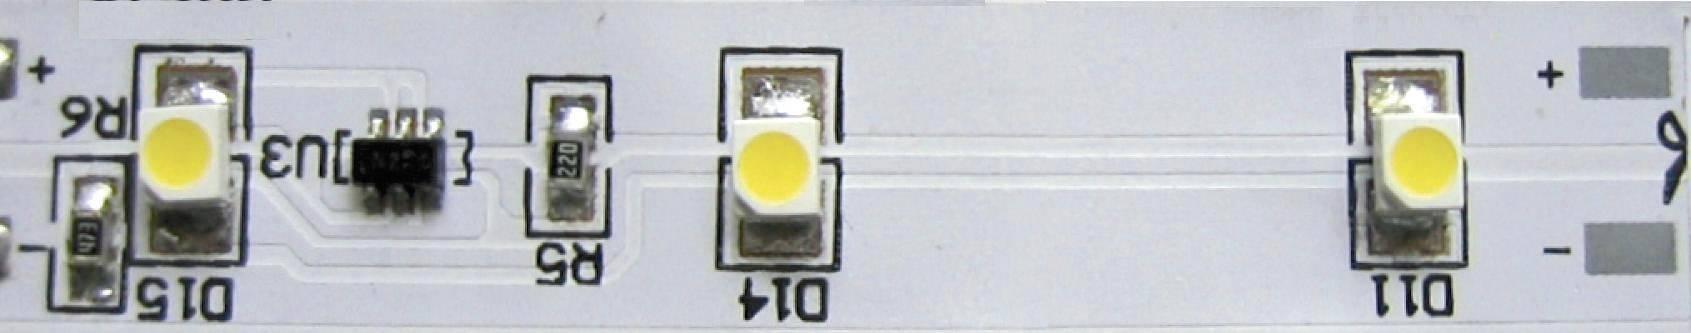 LED pás ohebný samolepicí 12VDC ledxon LED STRIPE 12VDC BLAU, 9009041, 50 mm, modrá